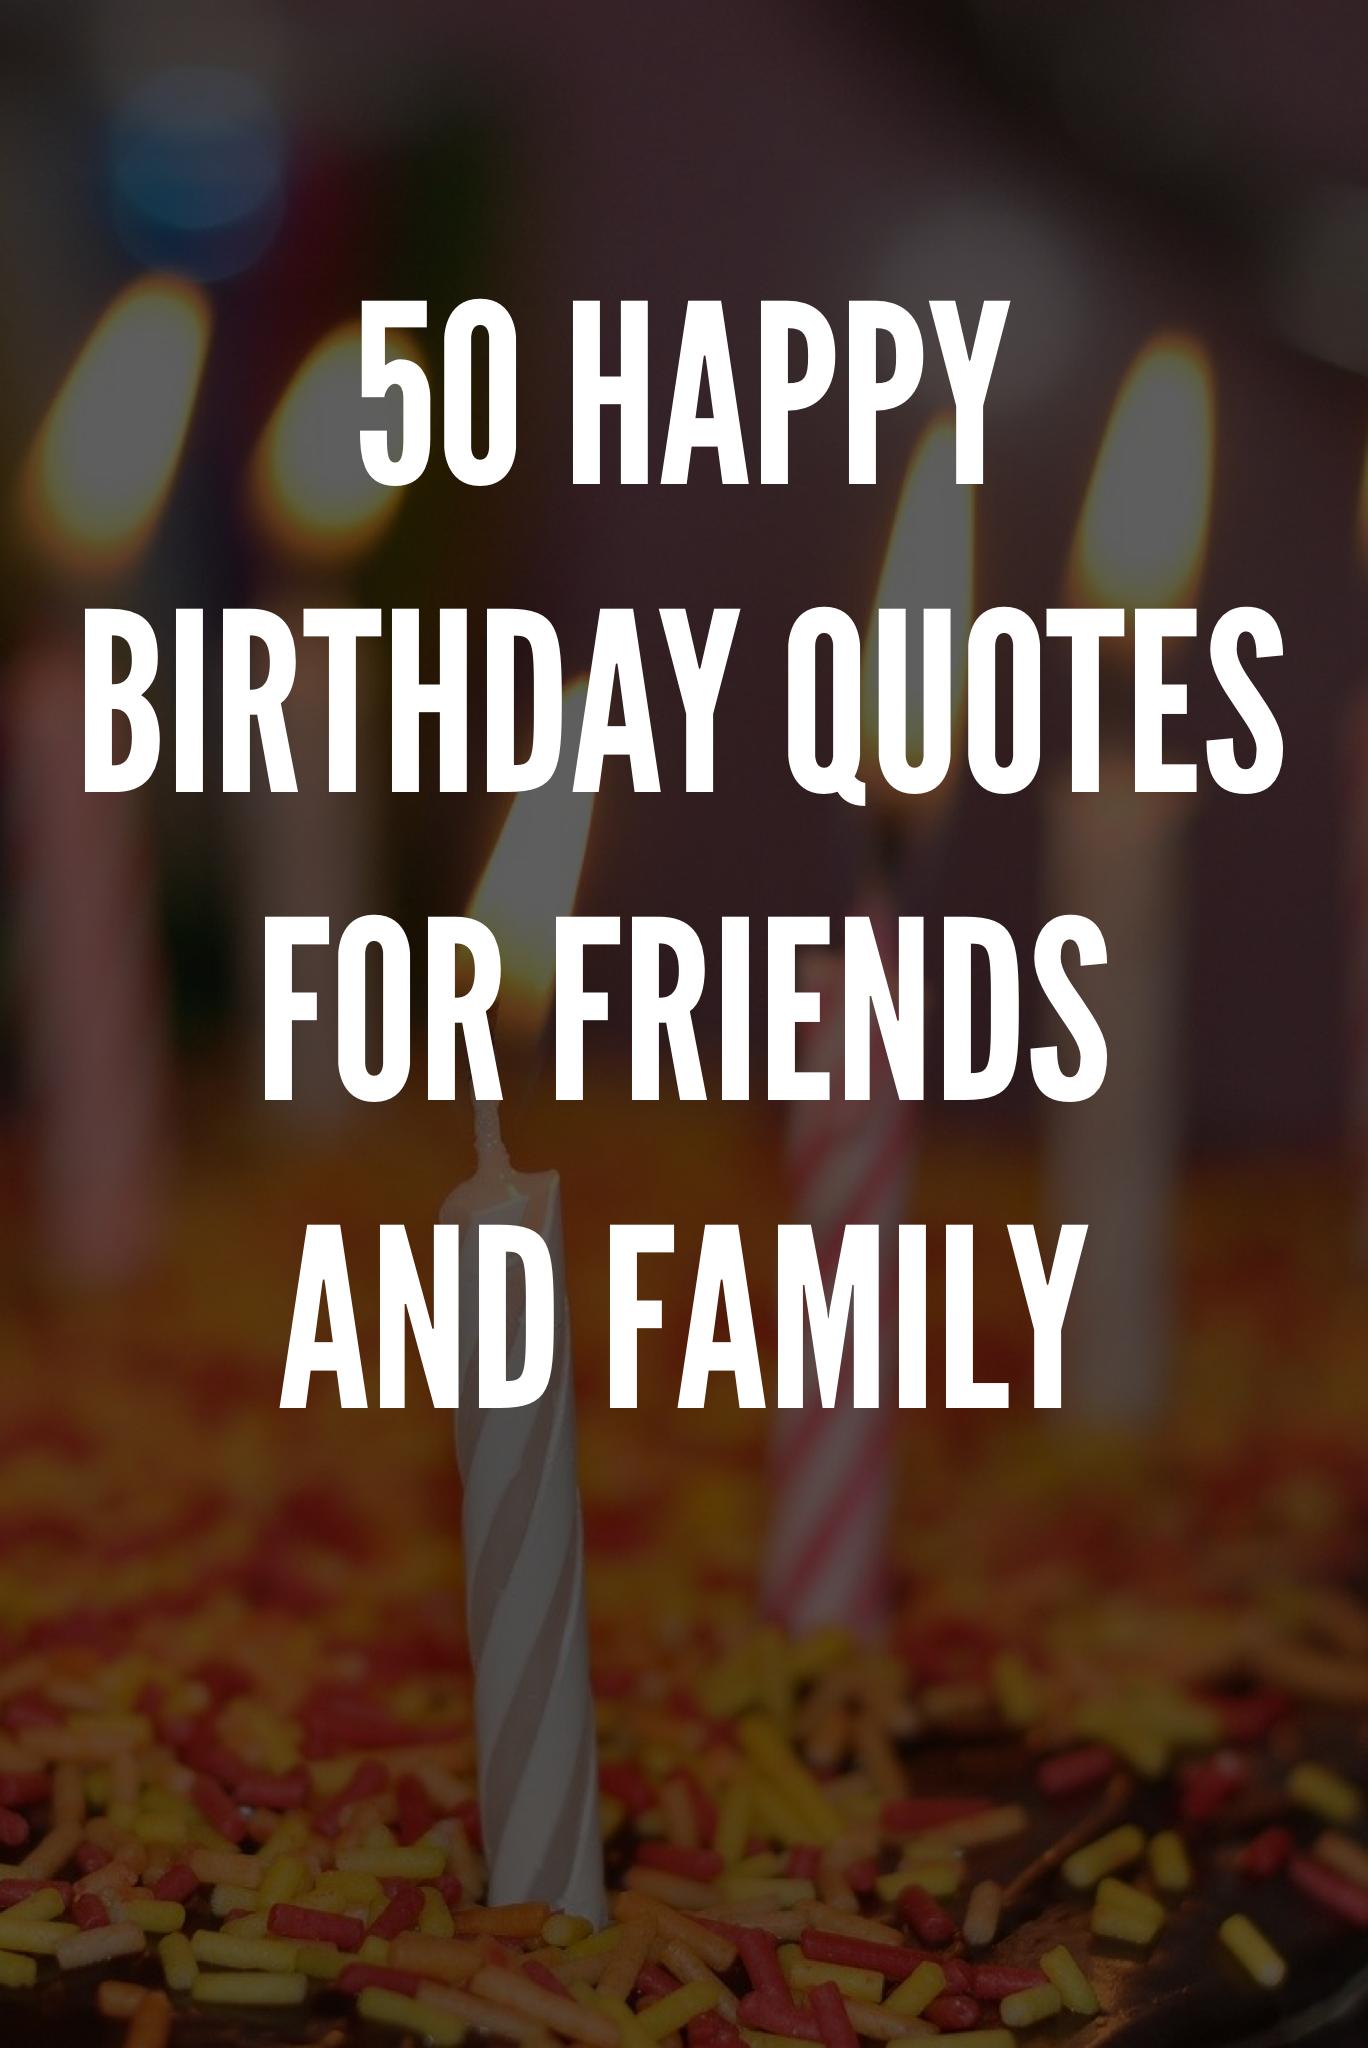 Birthday Movie Quotes : birthday, movie, quotes, Happy, Birthday, Quotes, Friends, Family, Friends,, Quotes,, Friend